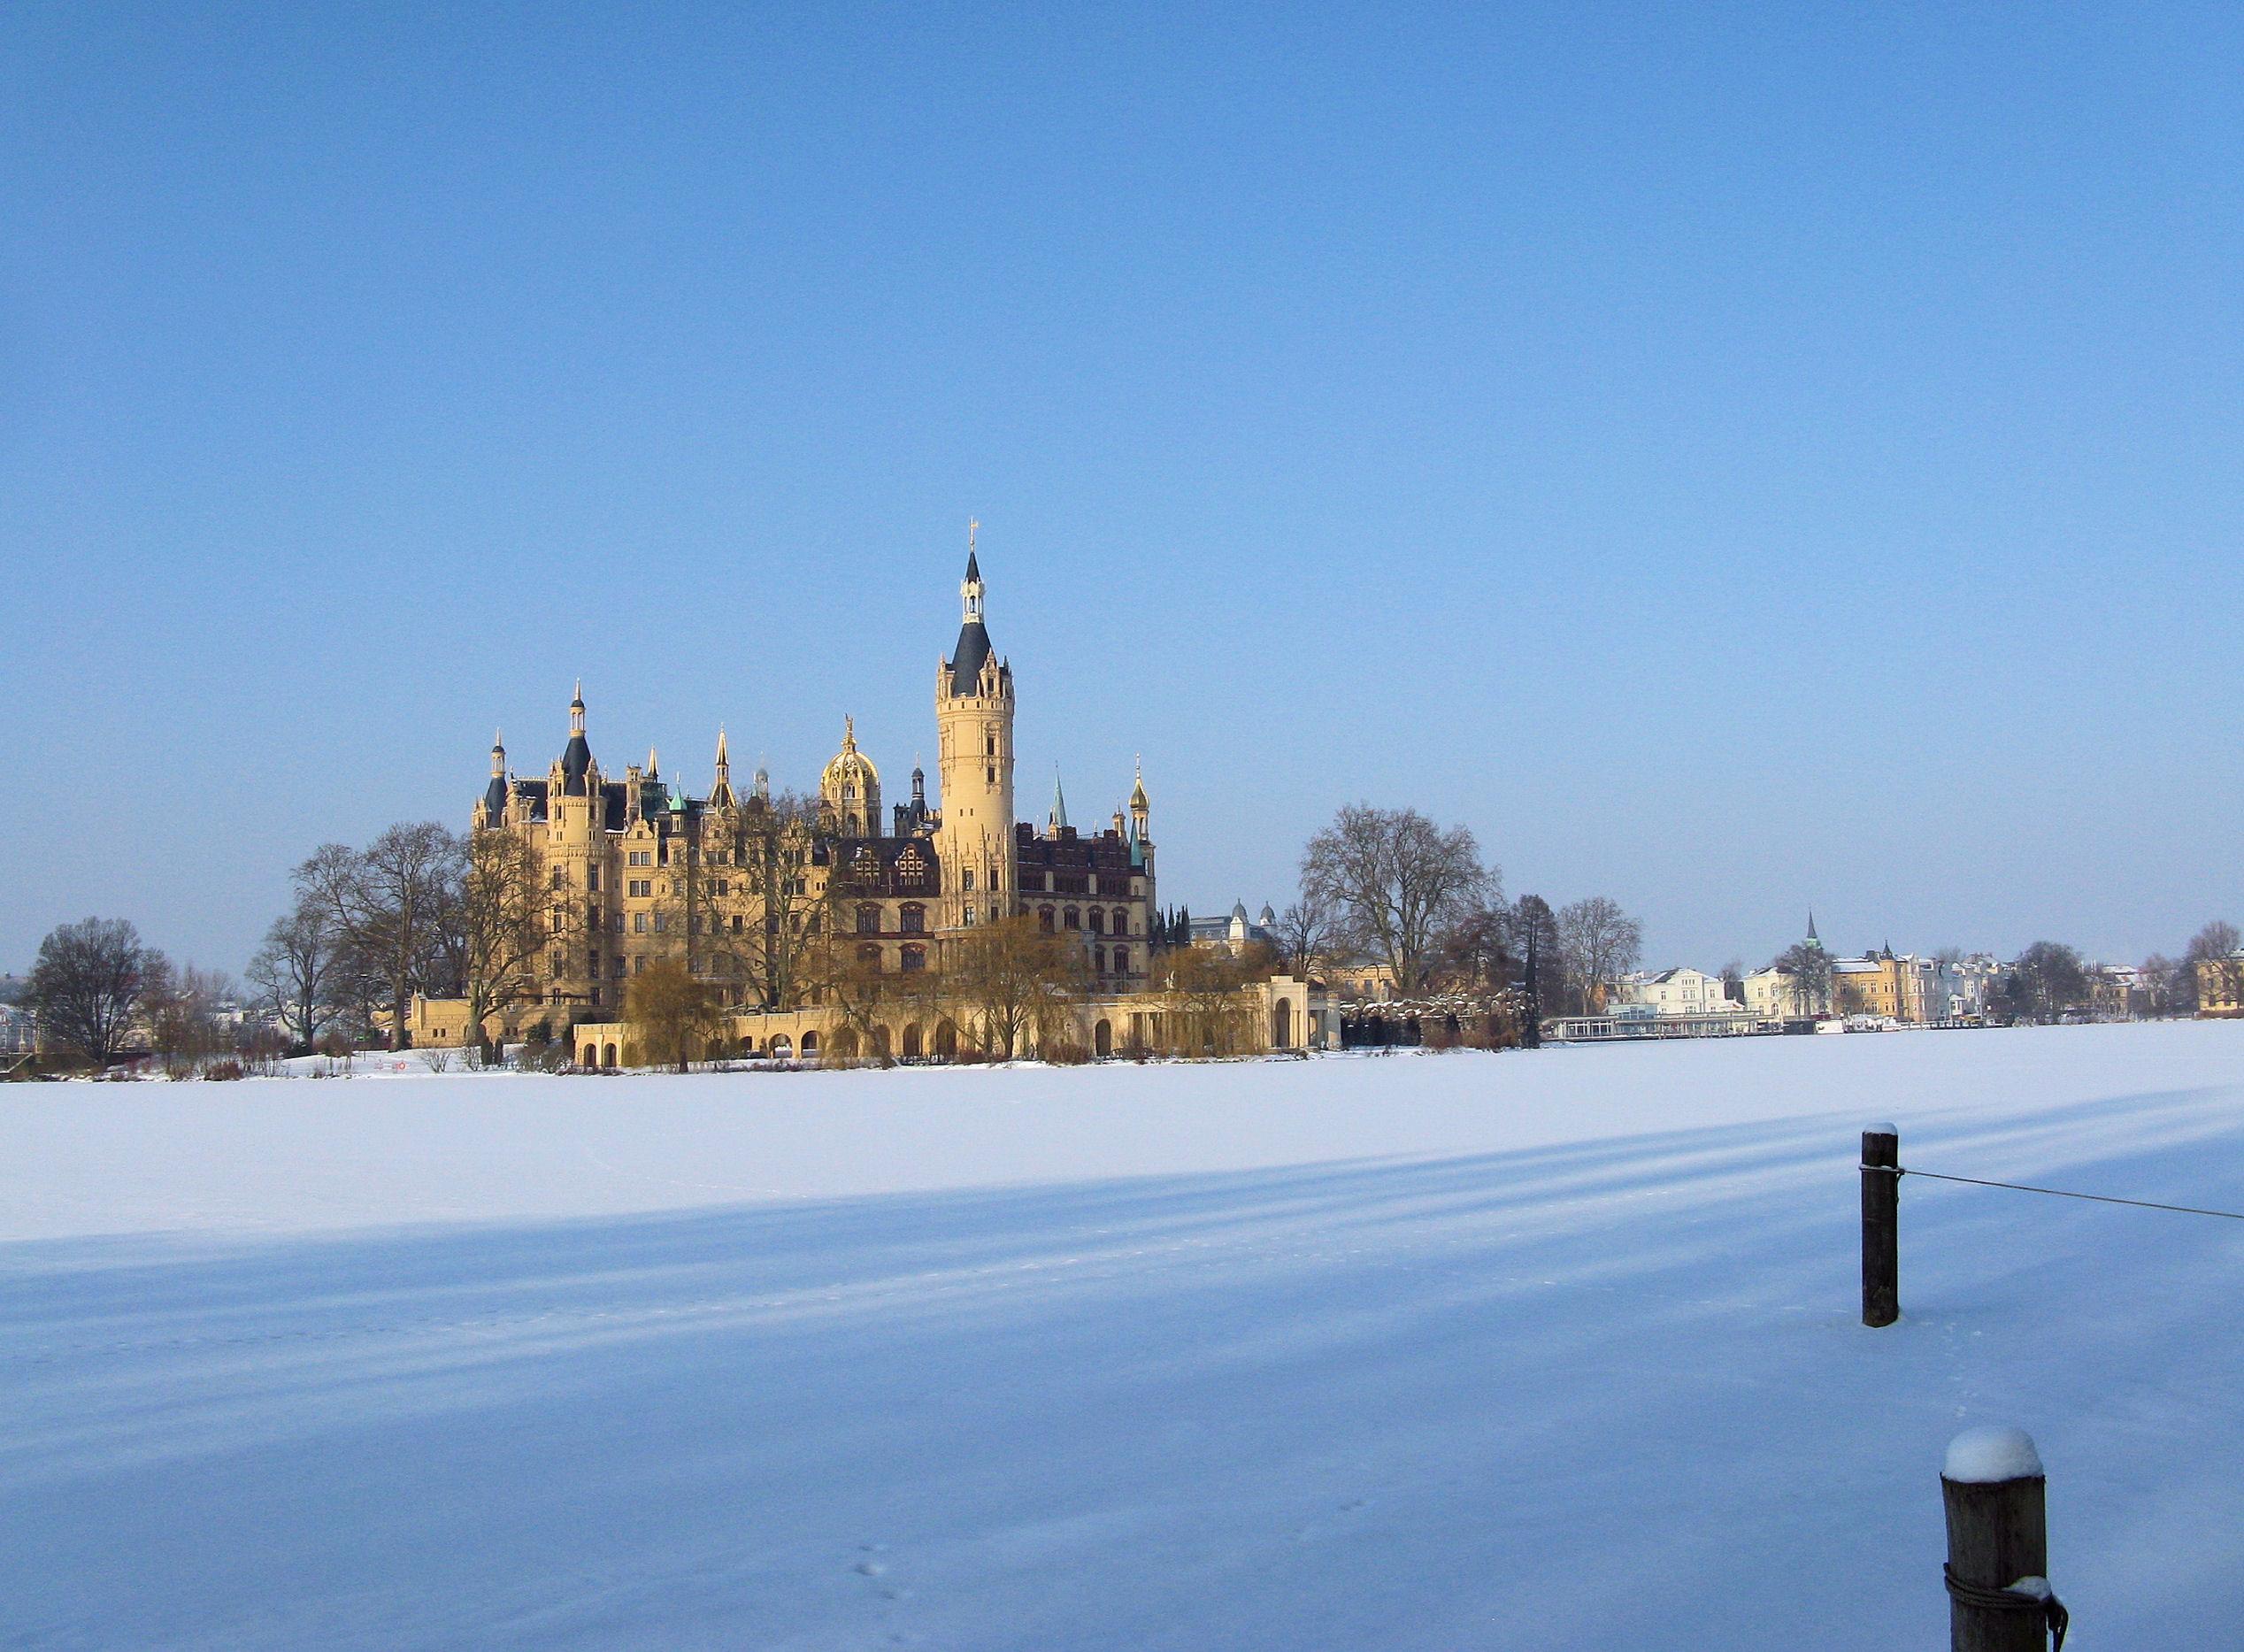 File:Schwerin Schloss zugefrorener Schweriner See 2010.